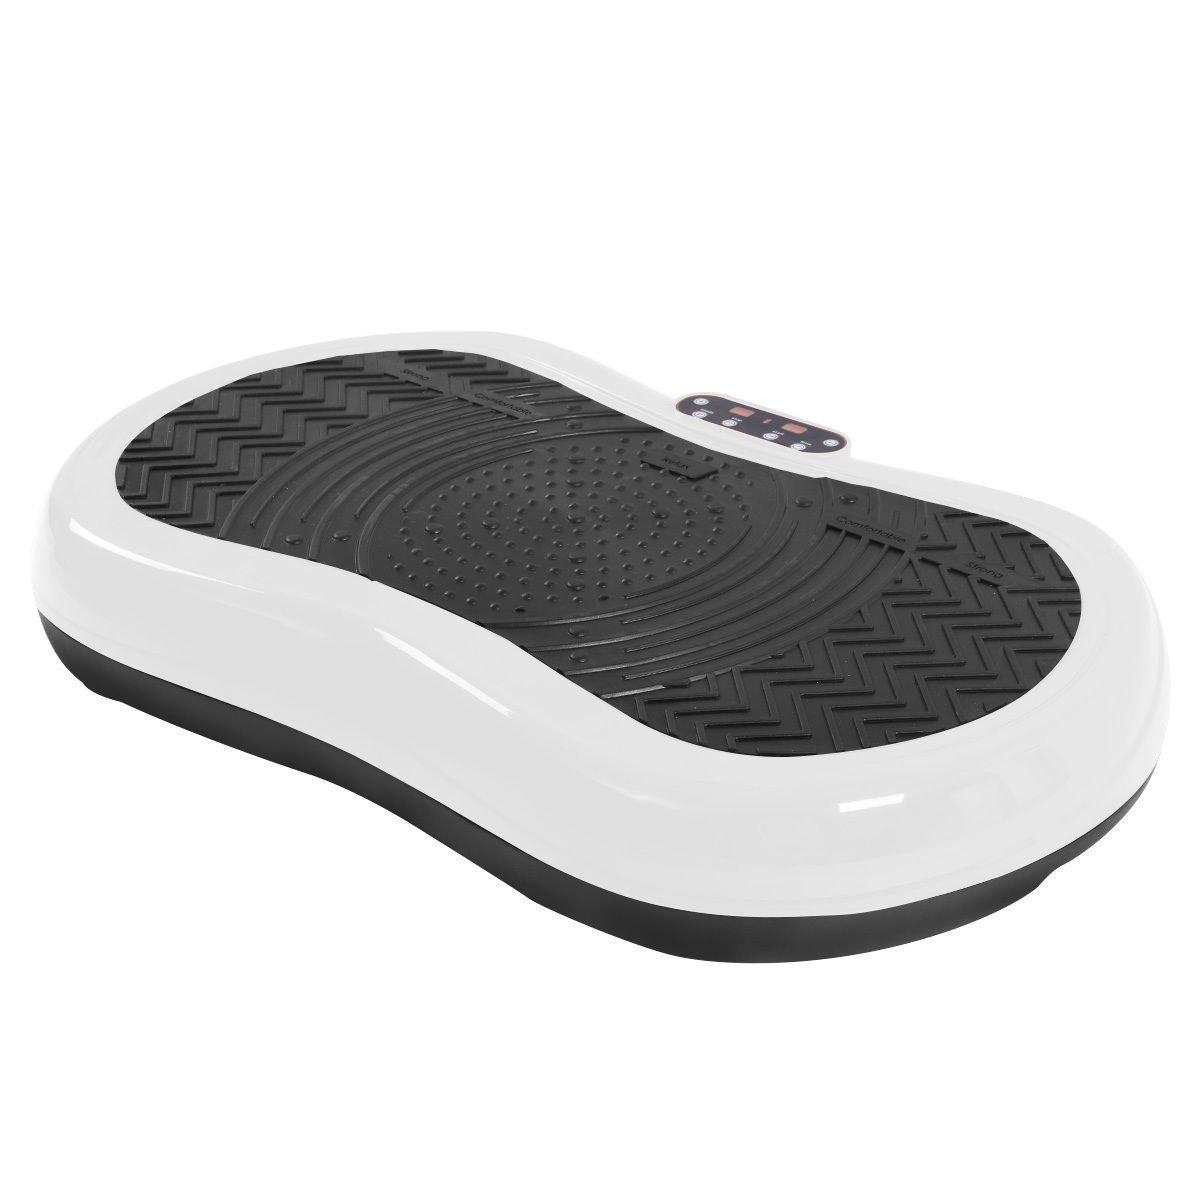 Tangkula Ultrathin Mini Crazy Fit Vibration Platform Massage Machine Fitness Gym (White)